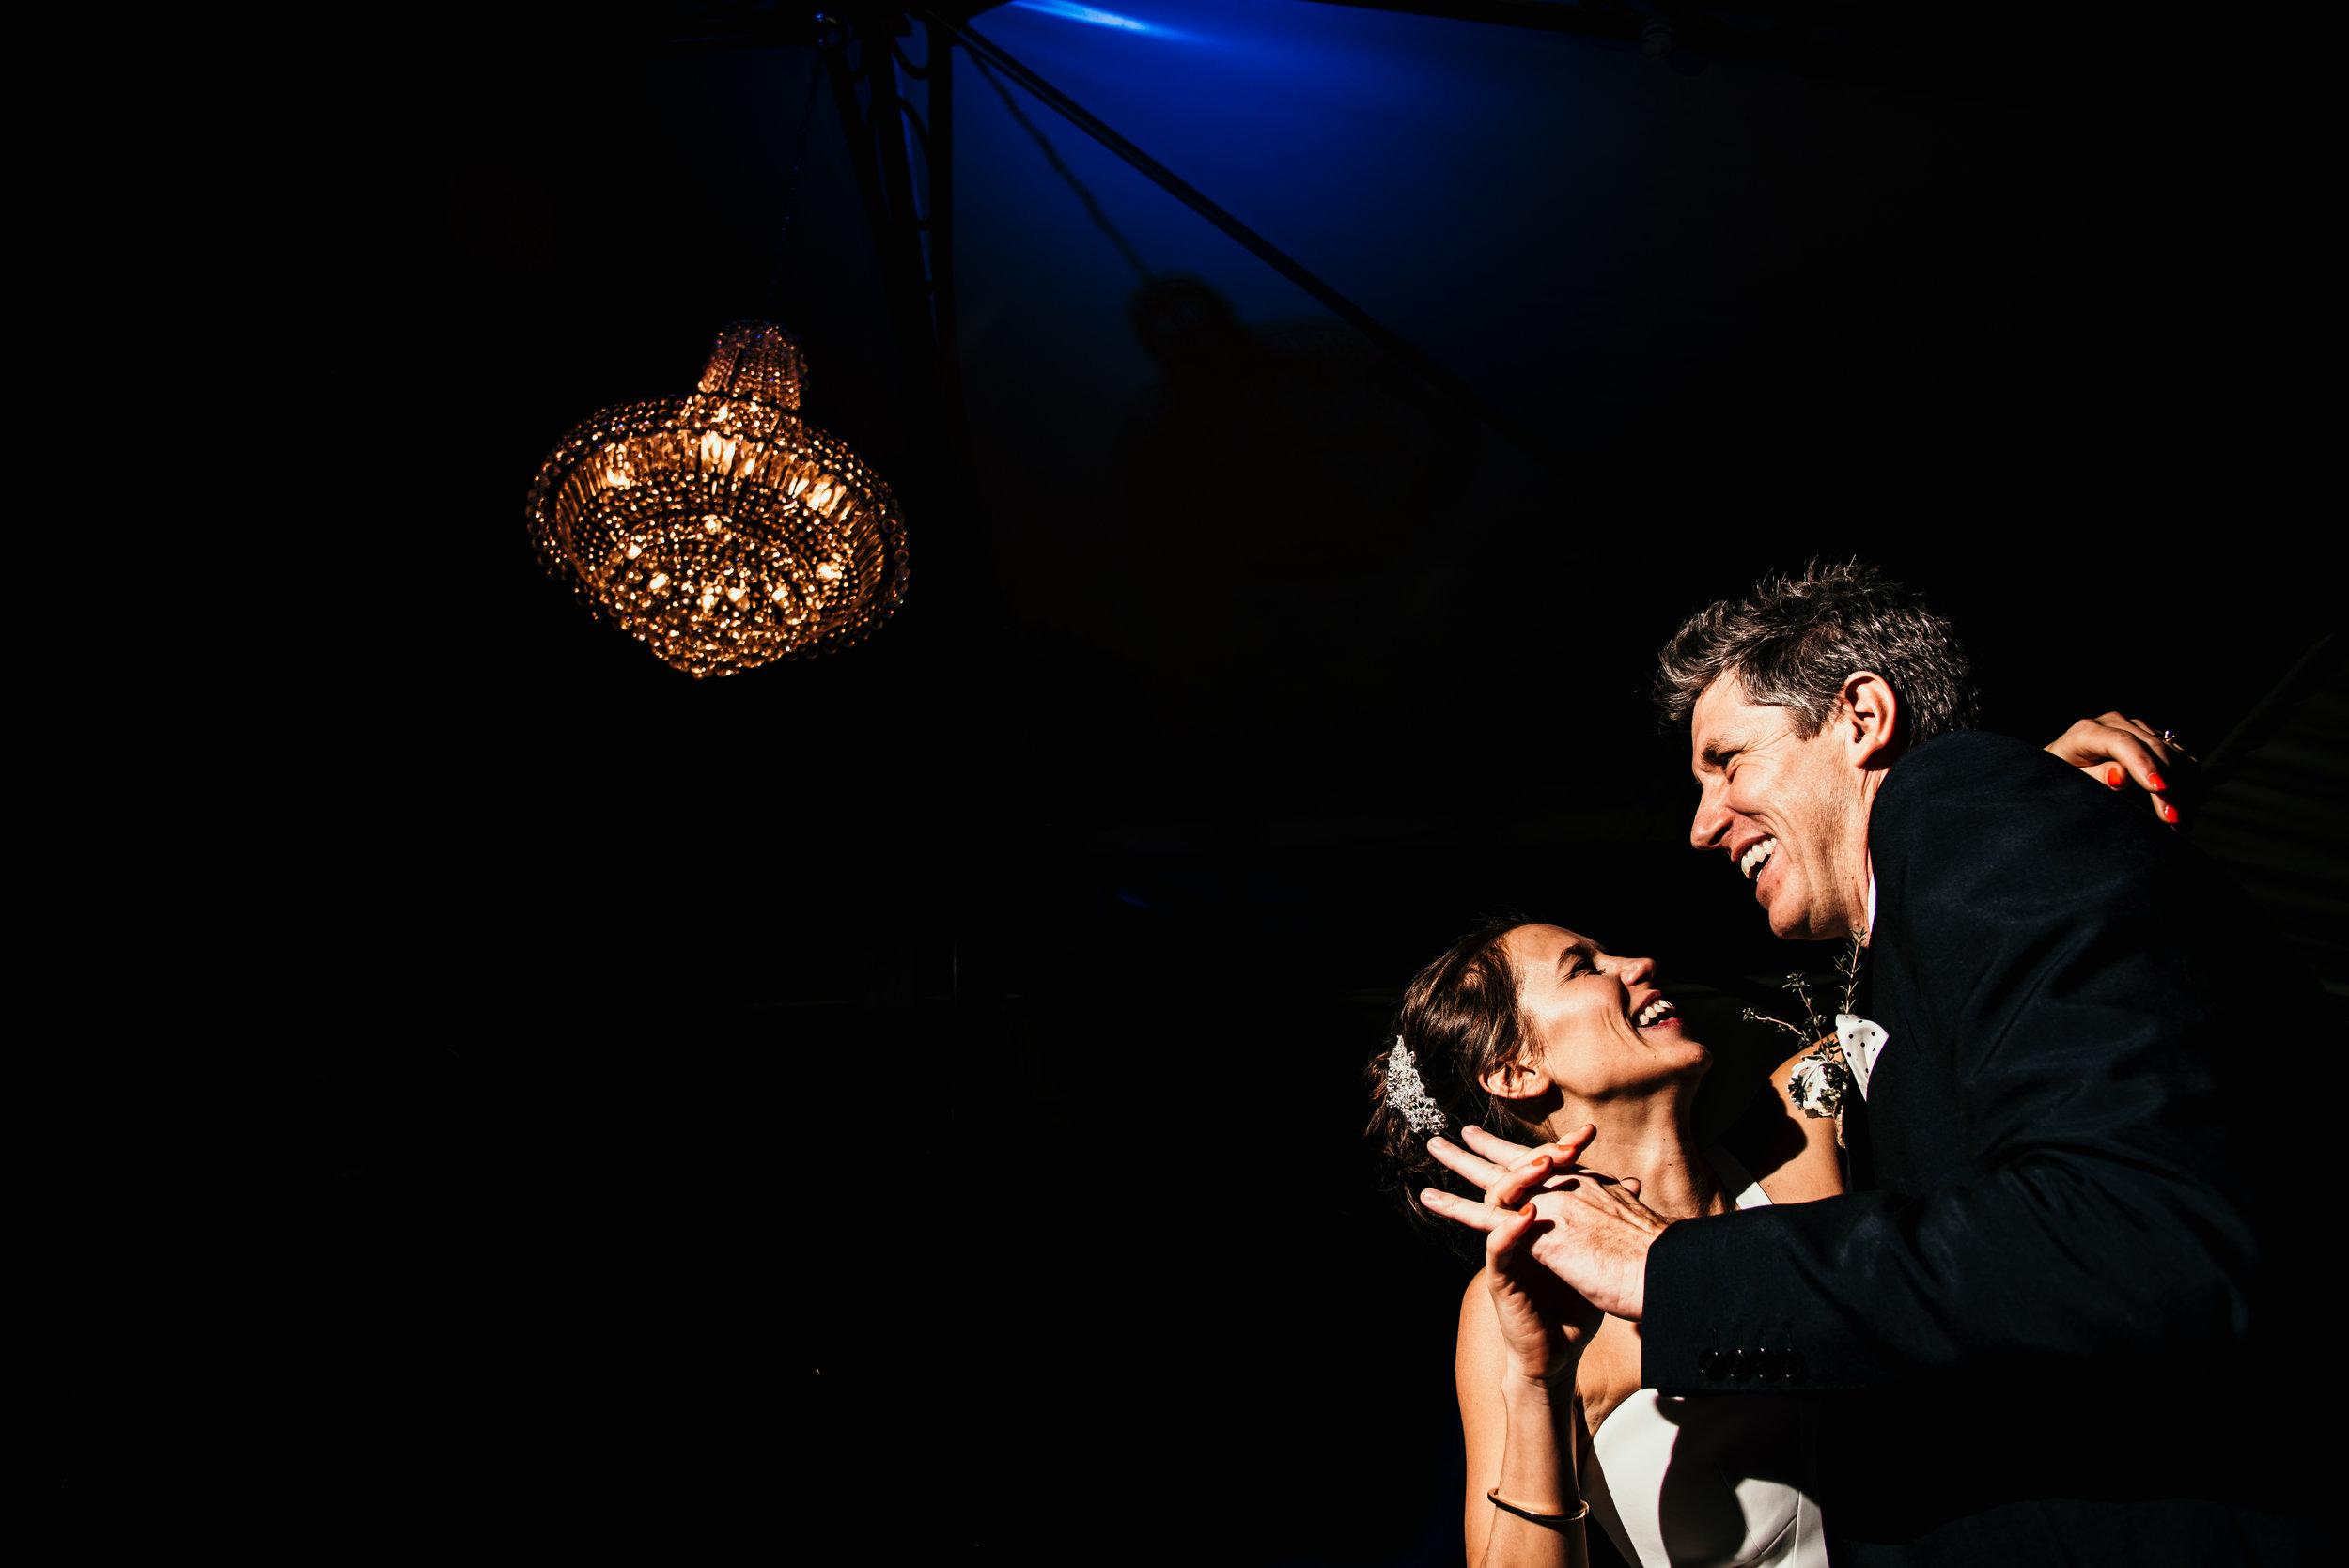 Paschoe-House-Wedding-Photographer-44.jpg